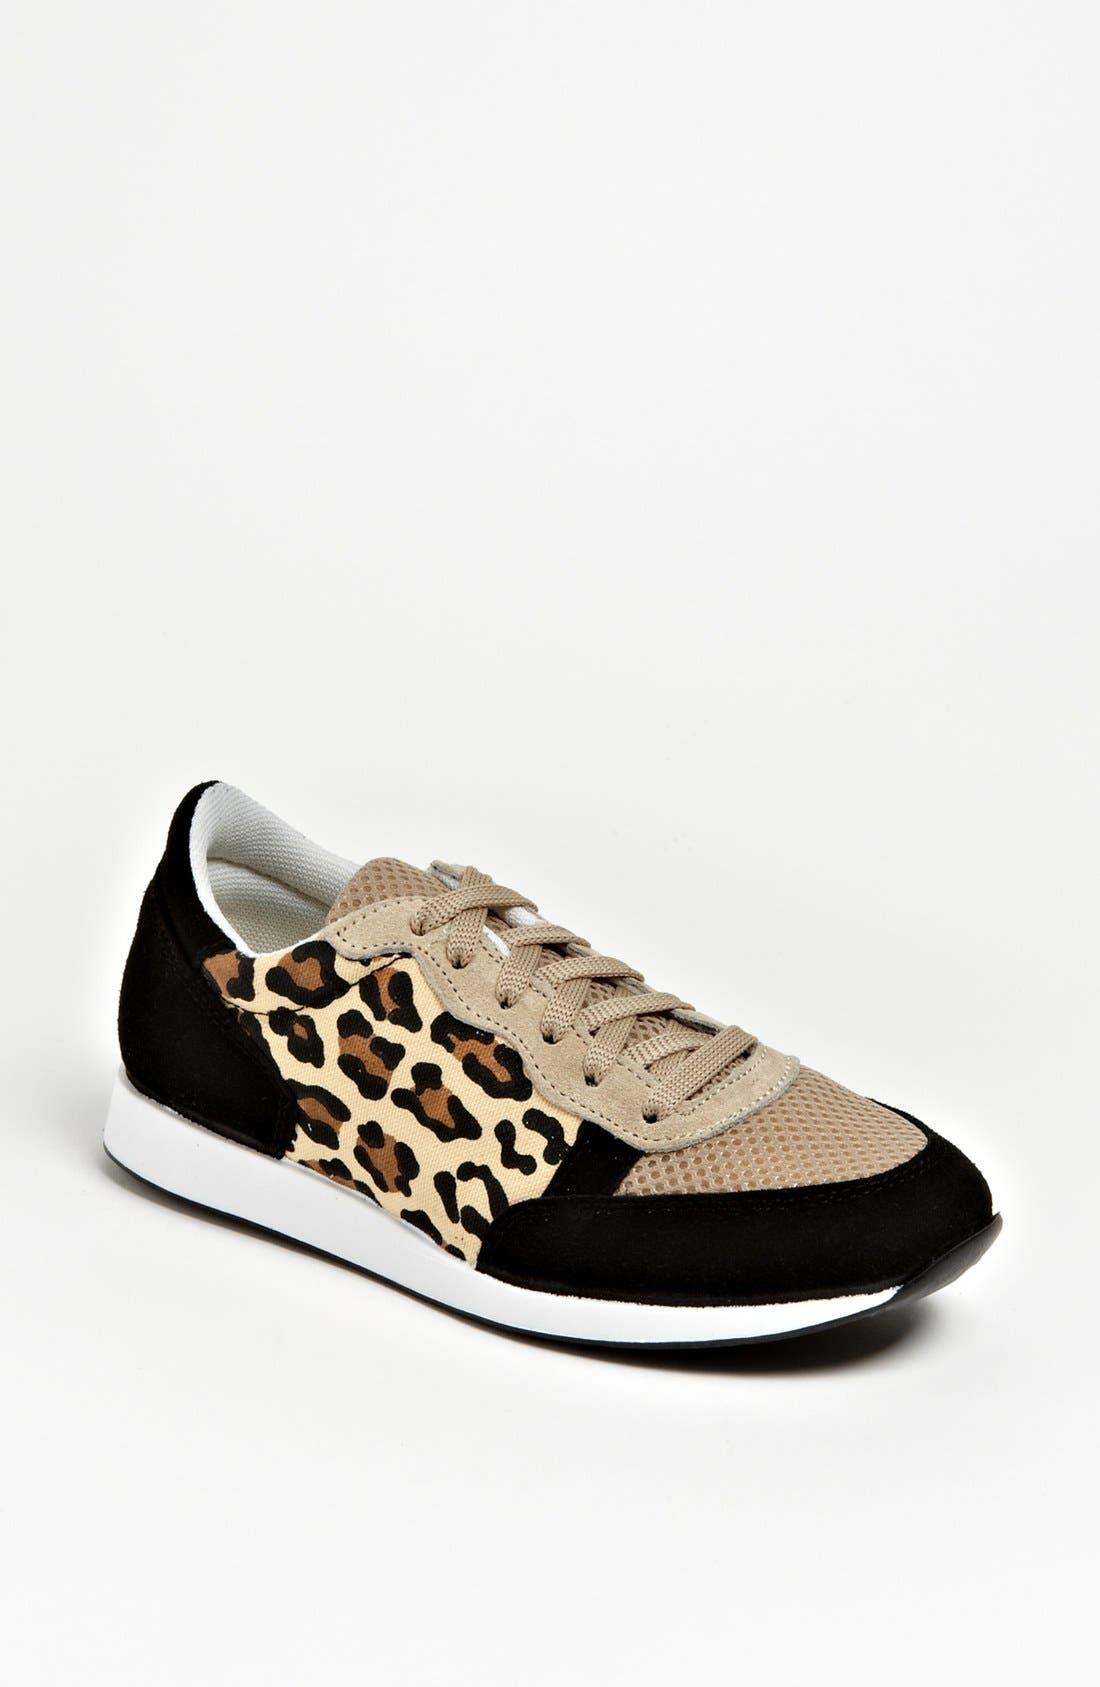 Alternate Image 1 Selected - Topshop 'Truffle' Sneaker